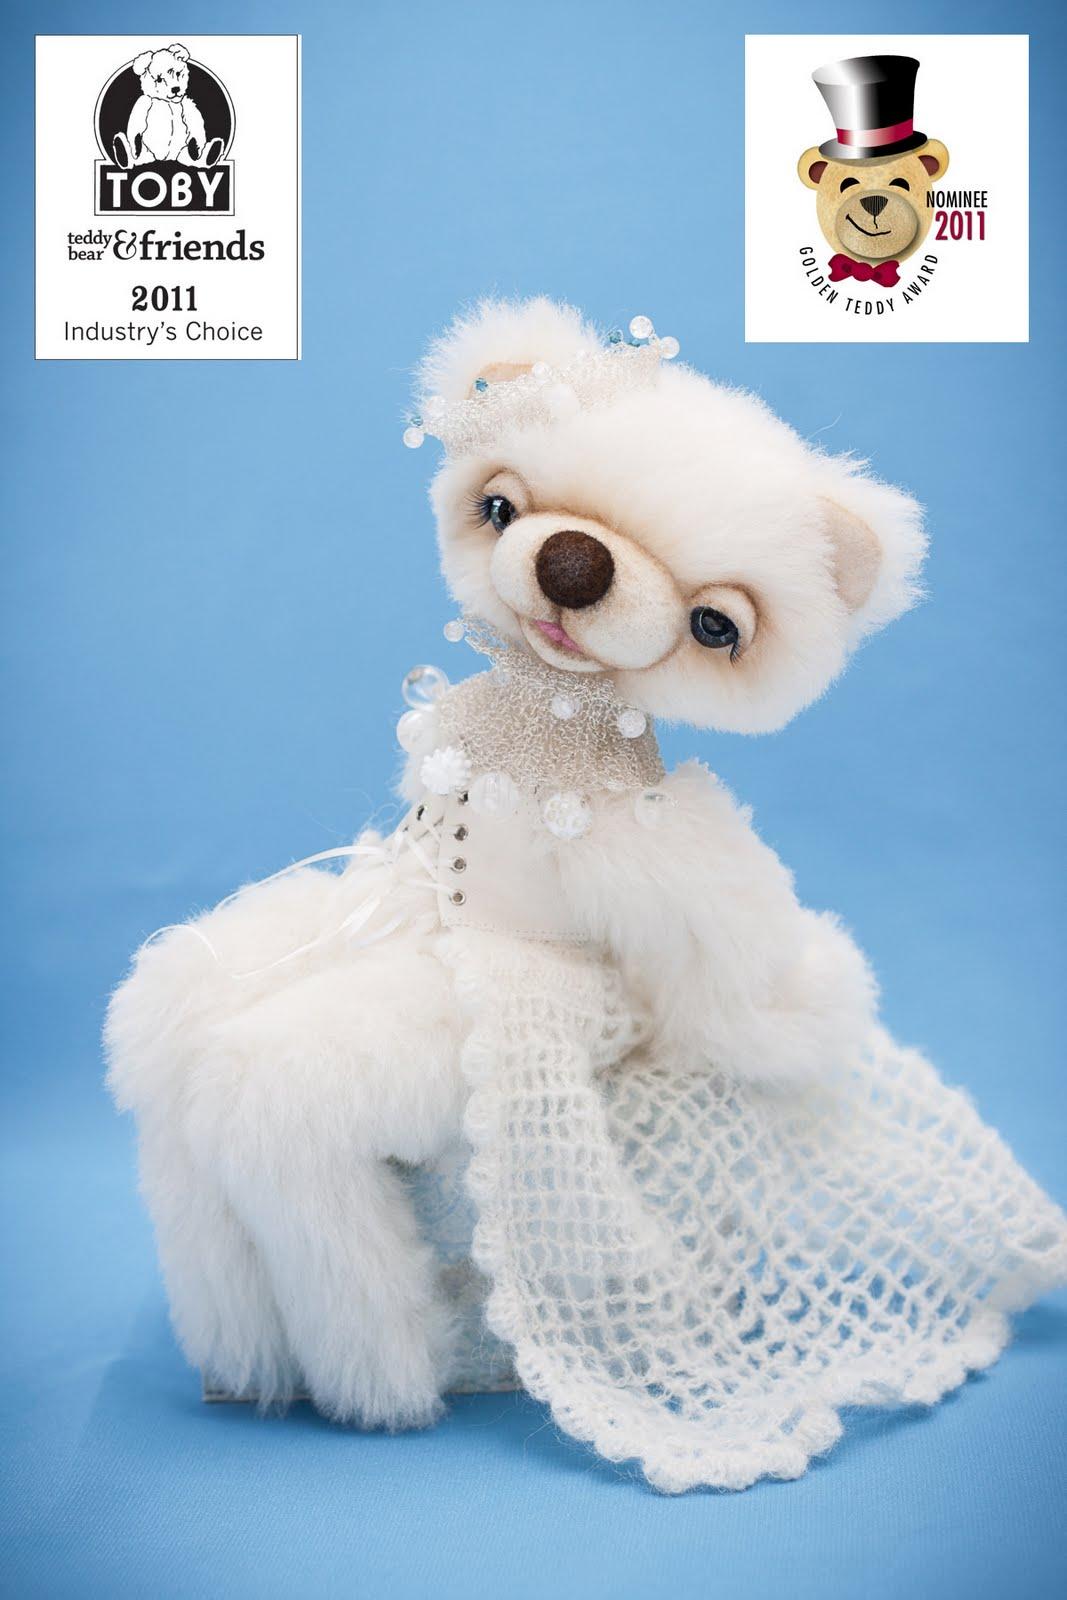 Lidinija - 2011 TOBY Industry Choice winner; 2011 Golden Teddy Award Nominee!!!